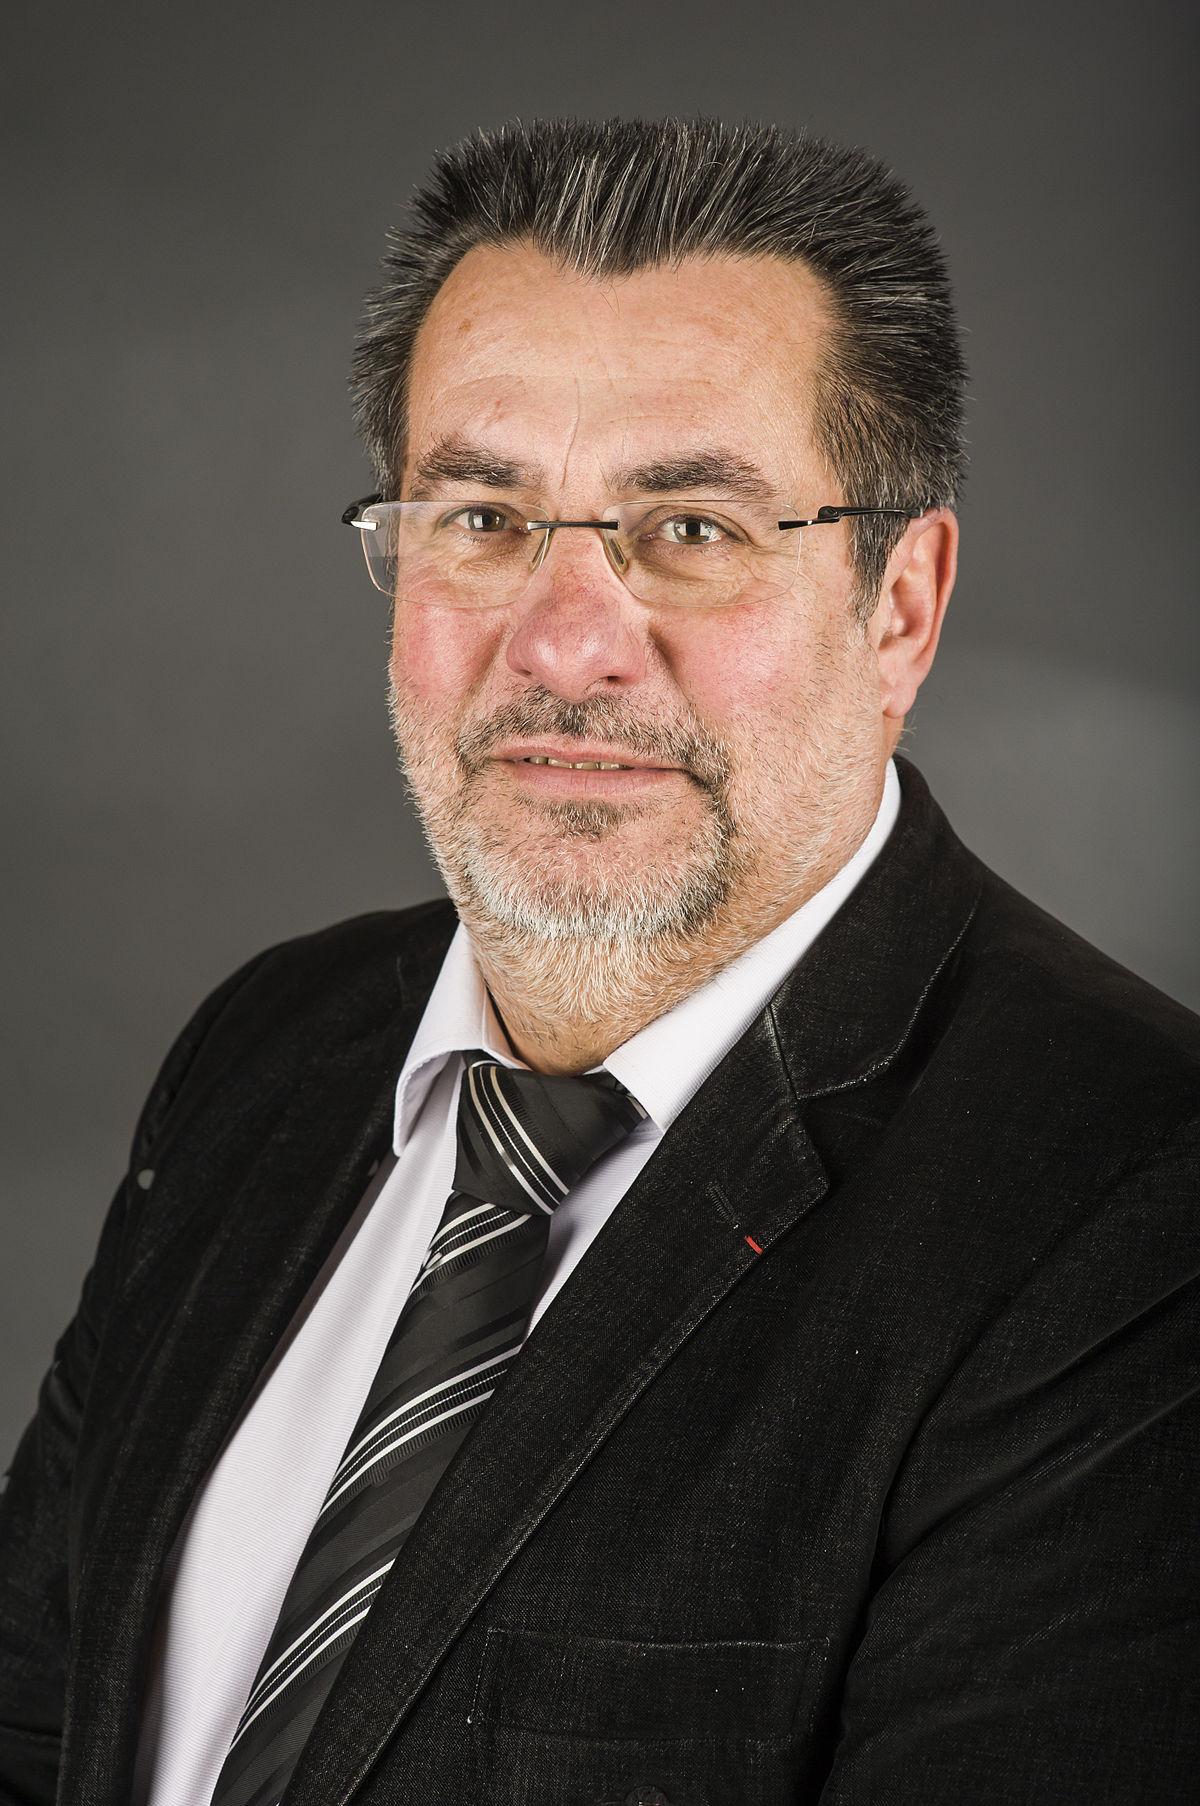 Jean Louis Sabaji Summer 2014: Jean-Louis Cottigny